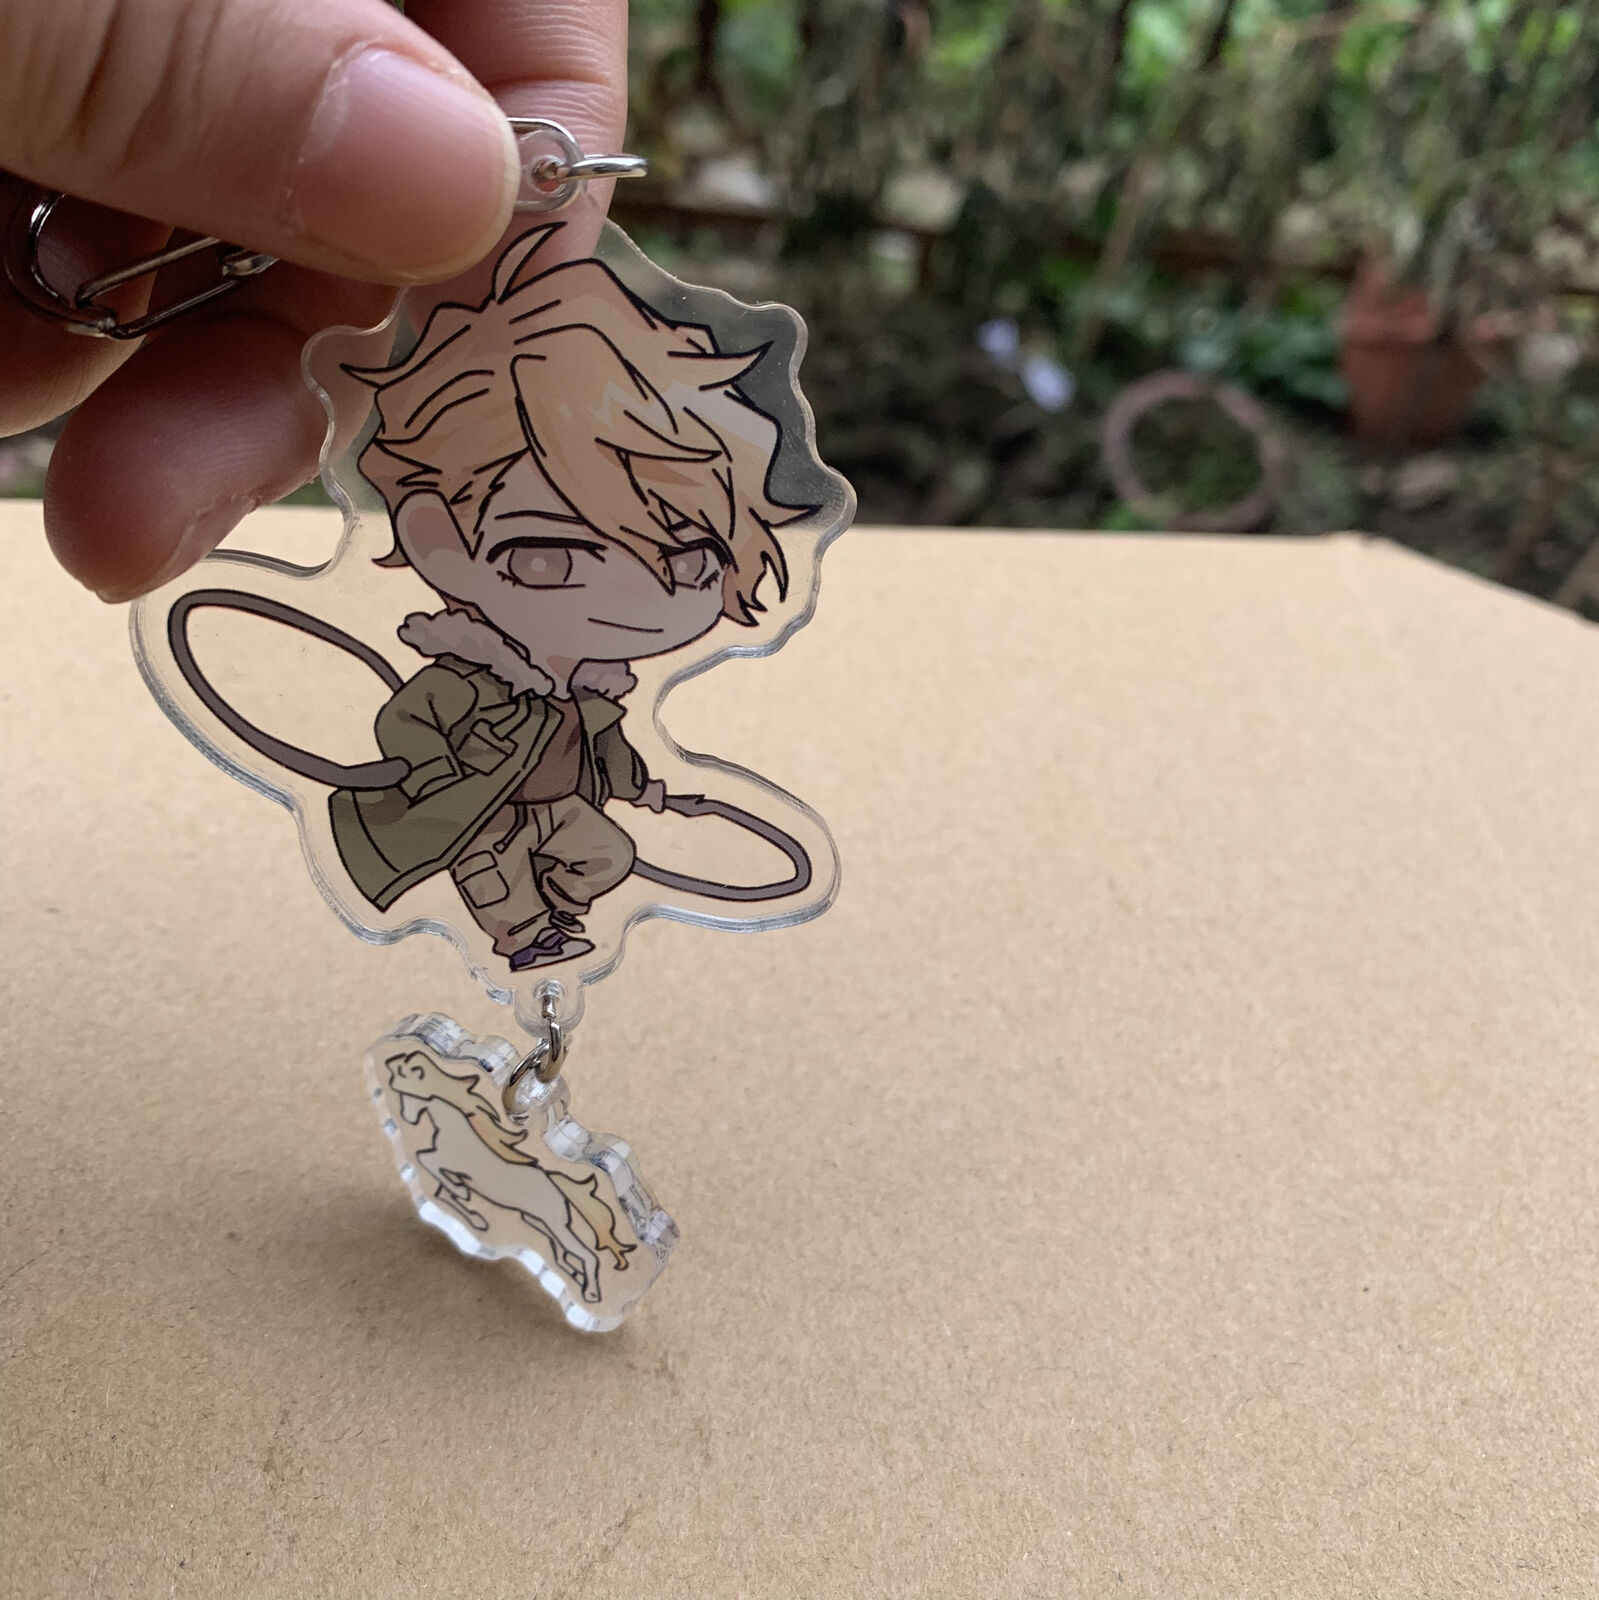 Anime Hitman Reborn Hibari Kyoya Dino Cavallone akrilik anahtarlık anahtarlık sevimli